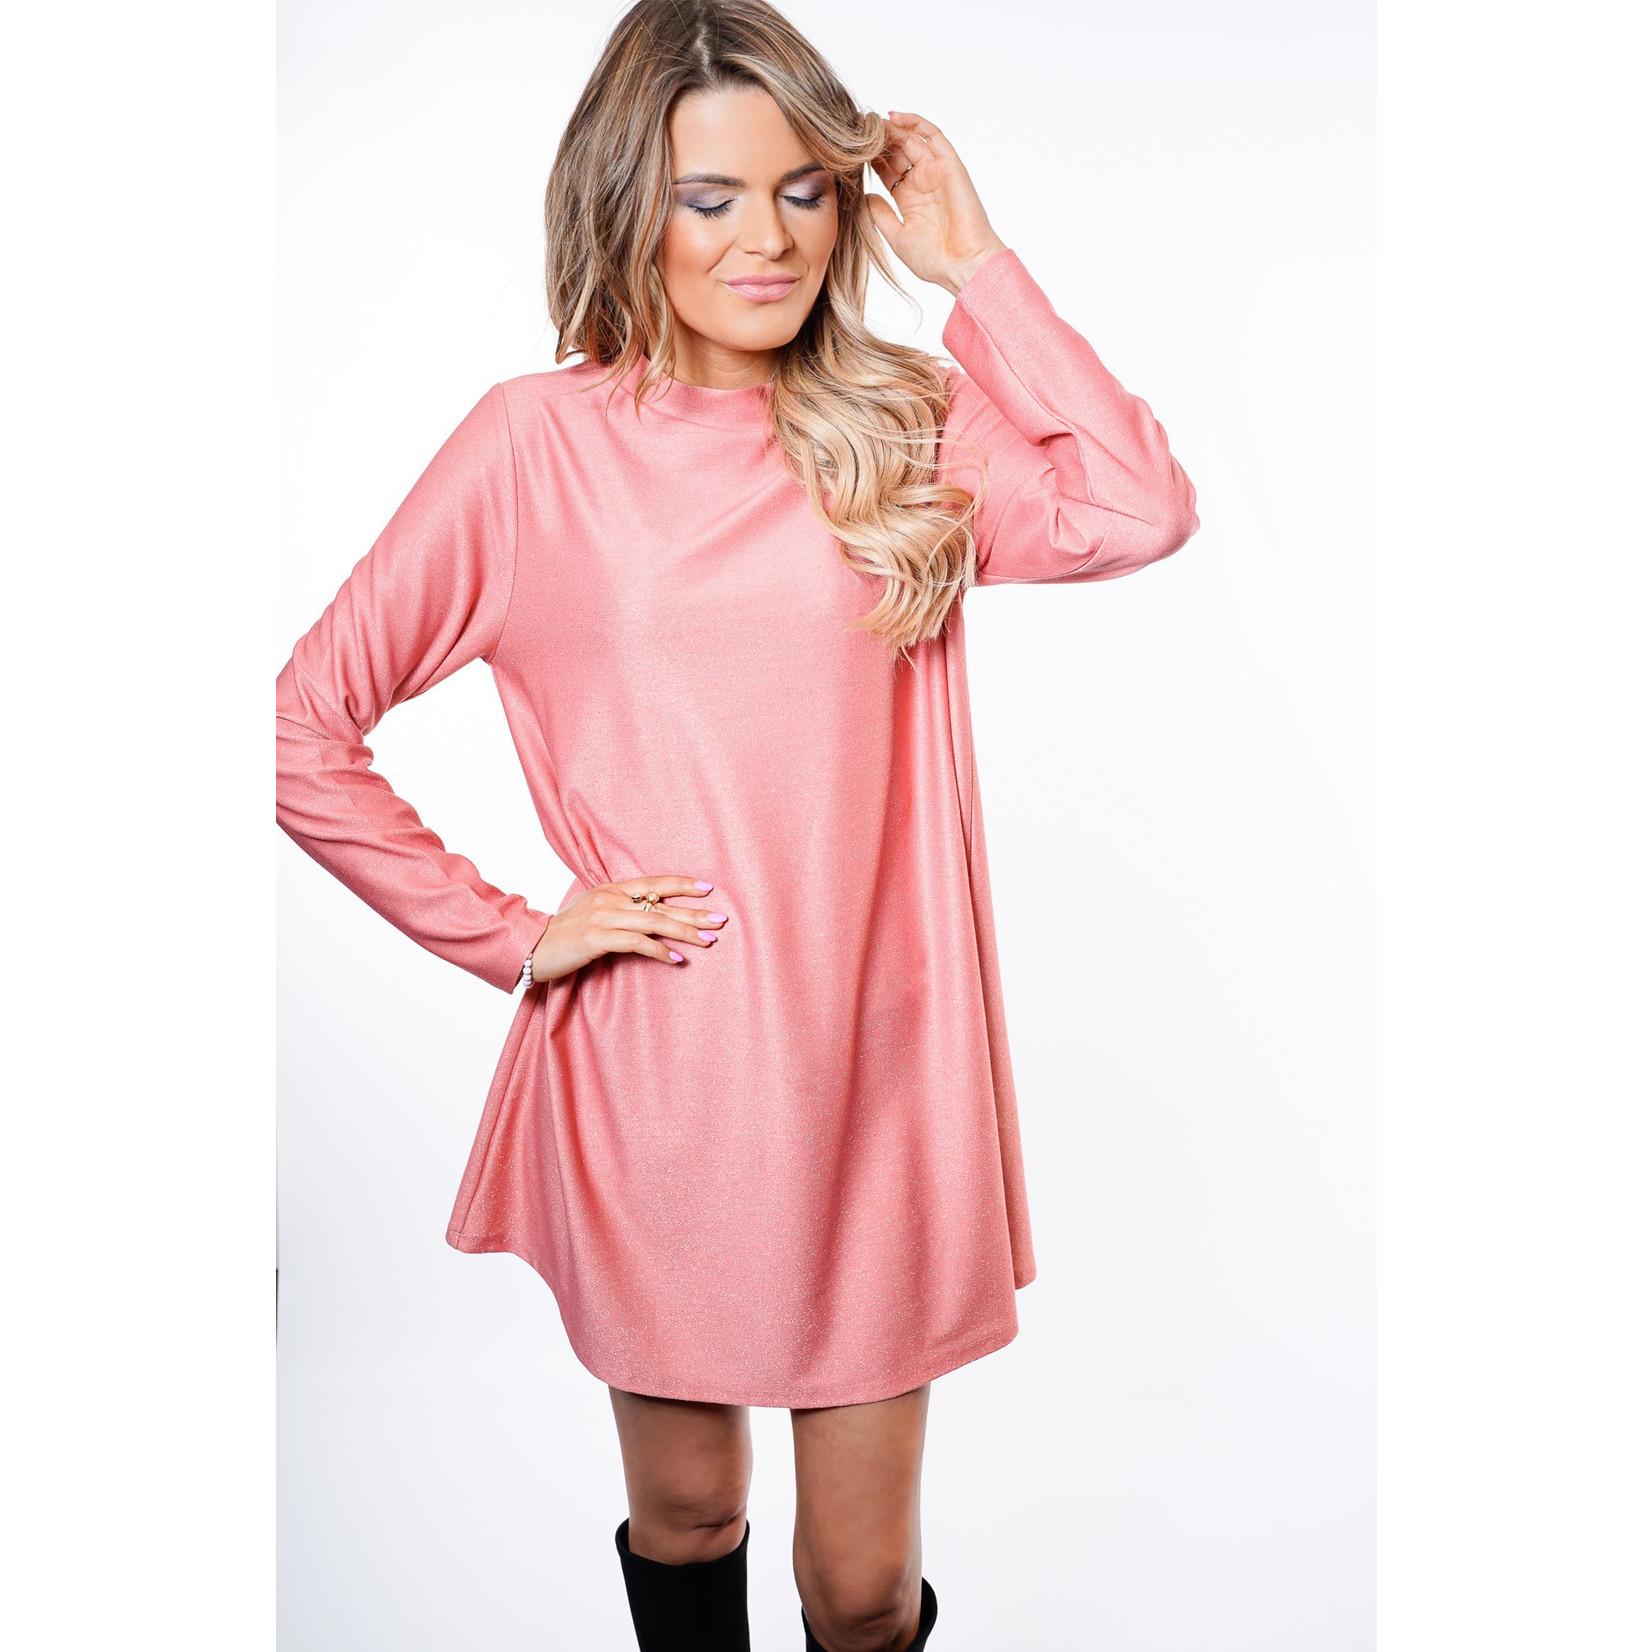 Yentl K Sweater dress 15-1